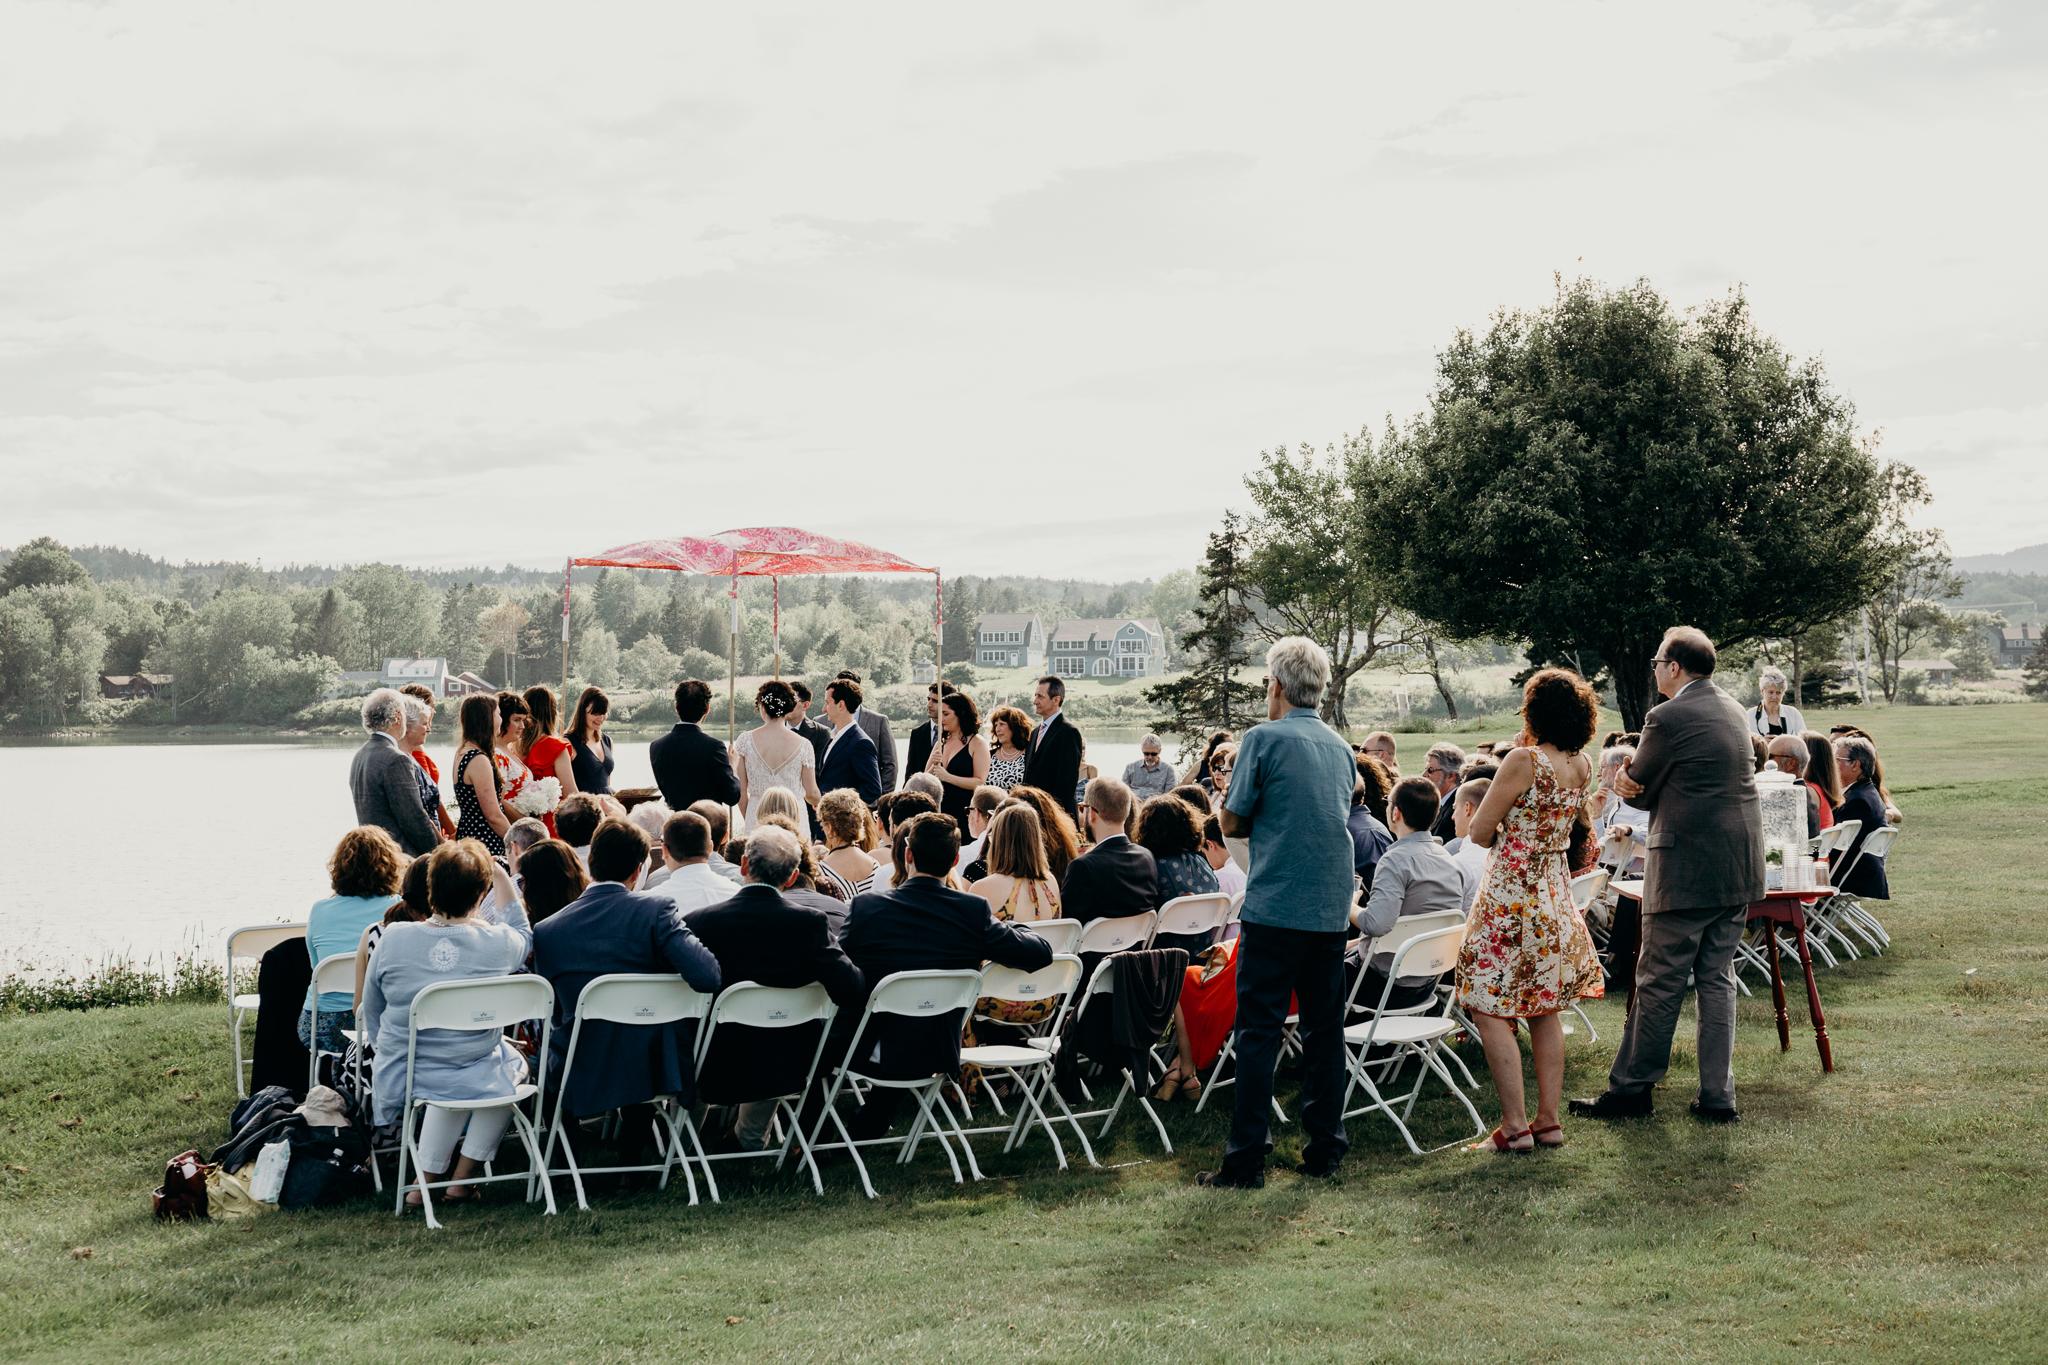 erinwheatco-1240 Maine Wedding by the Sea | Ruth & Ryan